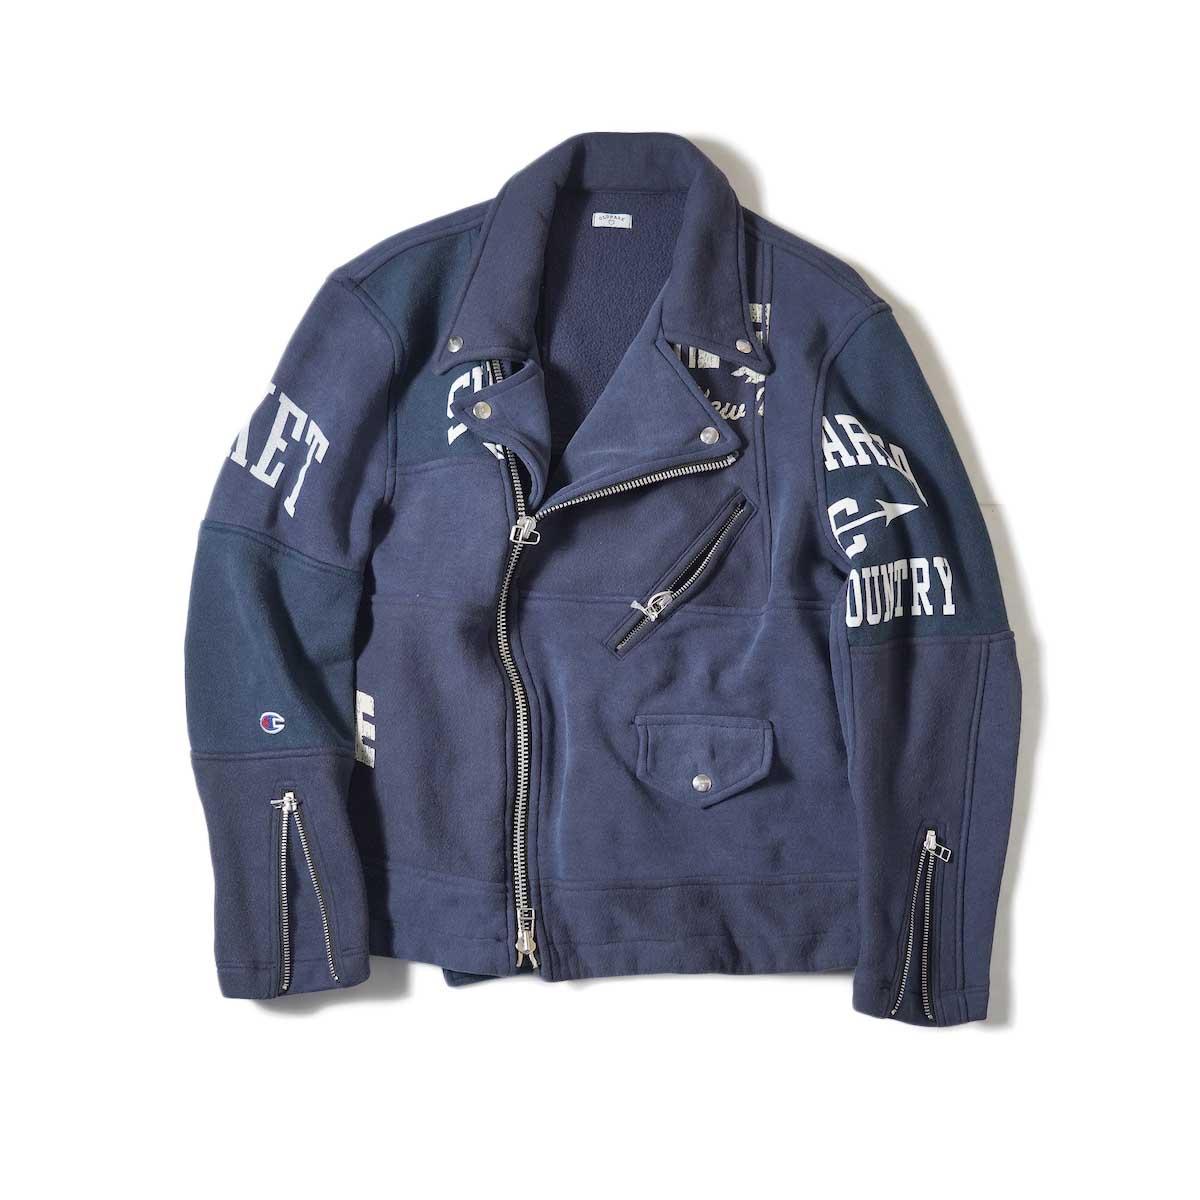 OLD PARK / Oversized Riders Jacket -Sweat-Navy